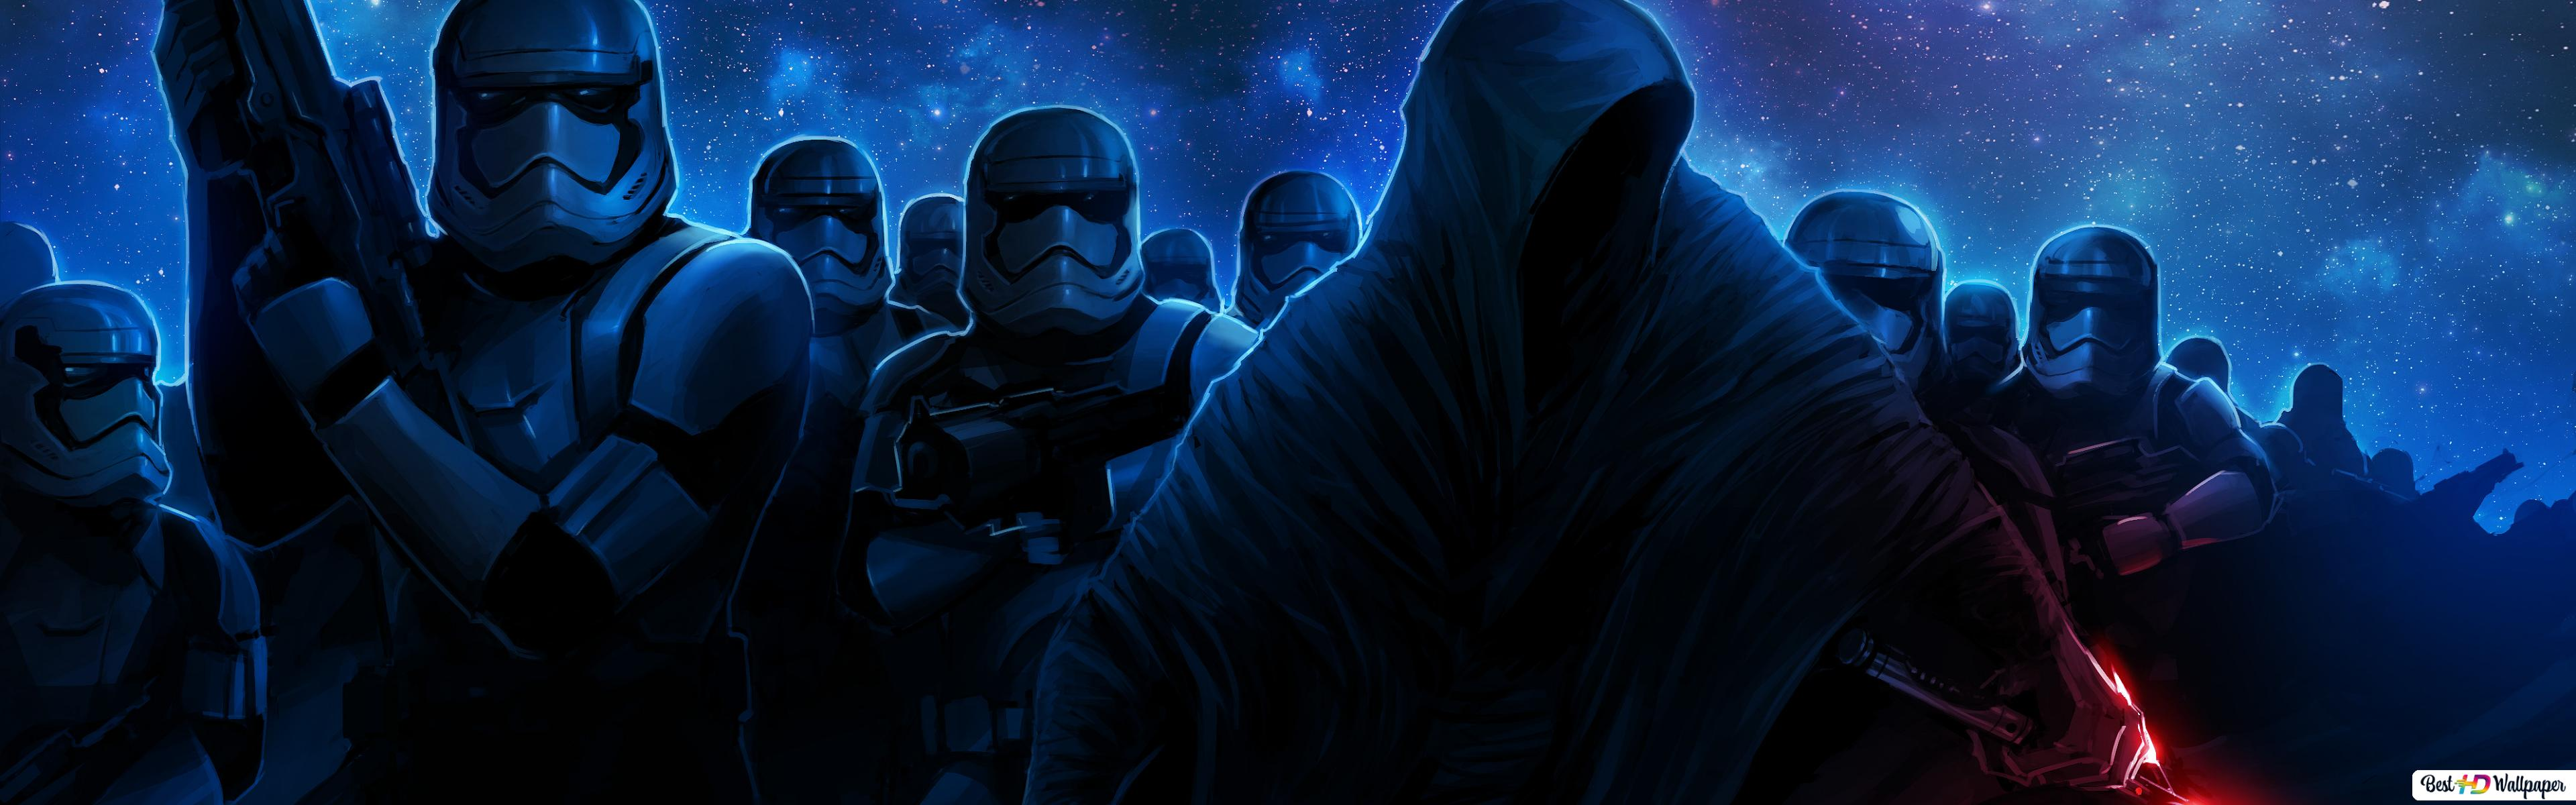 Star Wars Episode Vii The Force Awakens Stormtrooper Hd